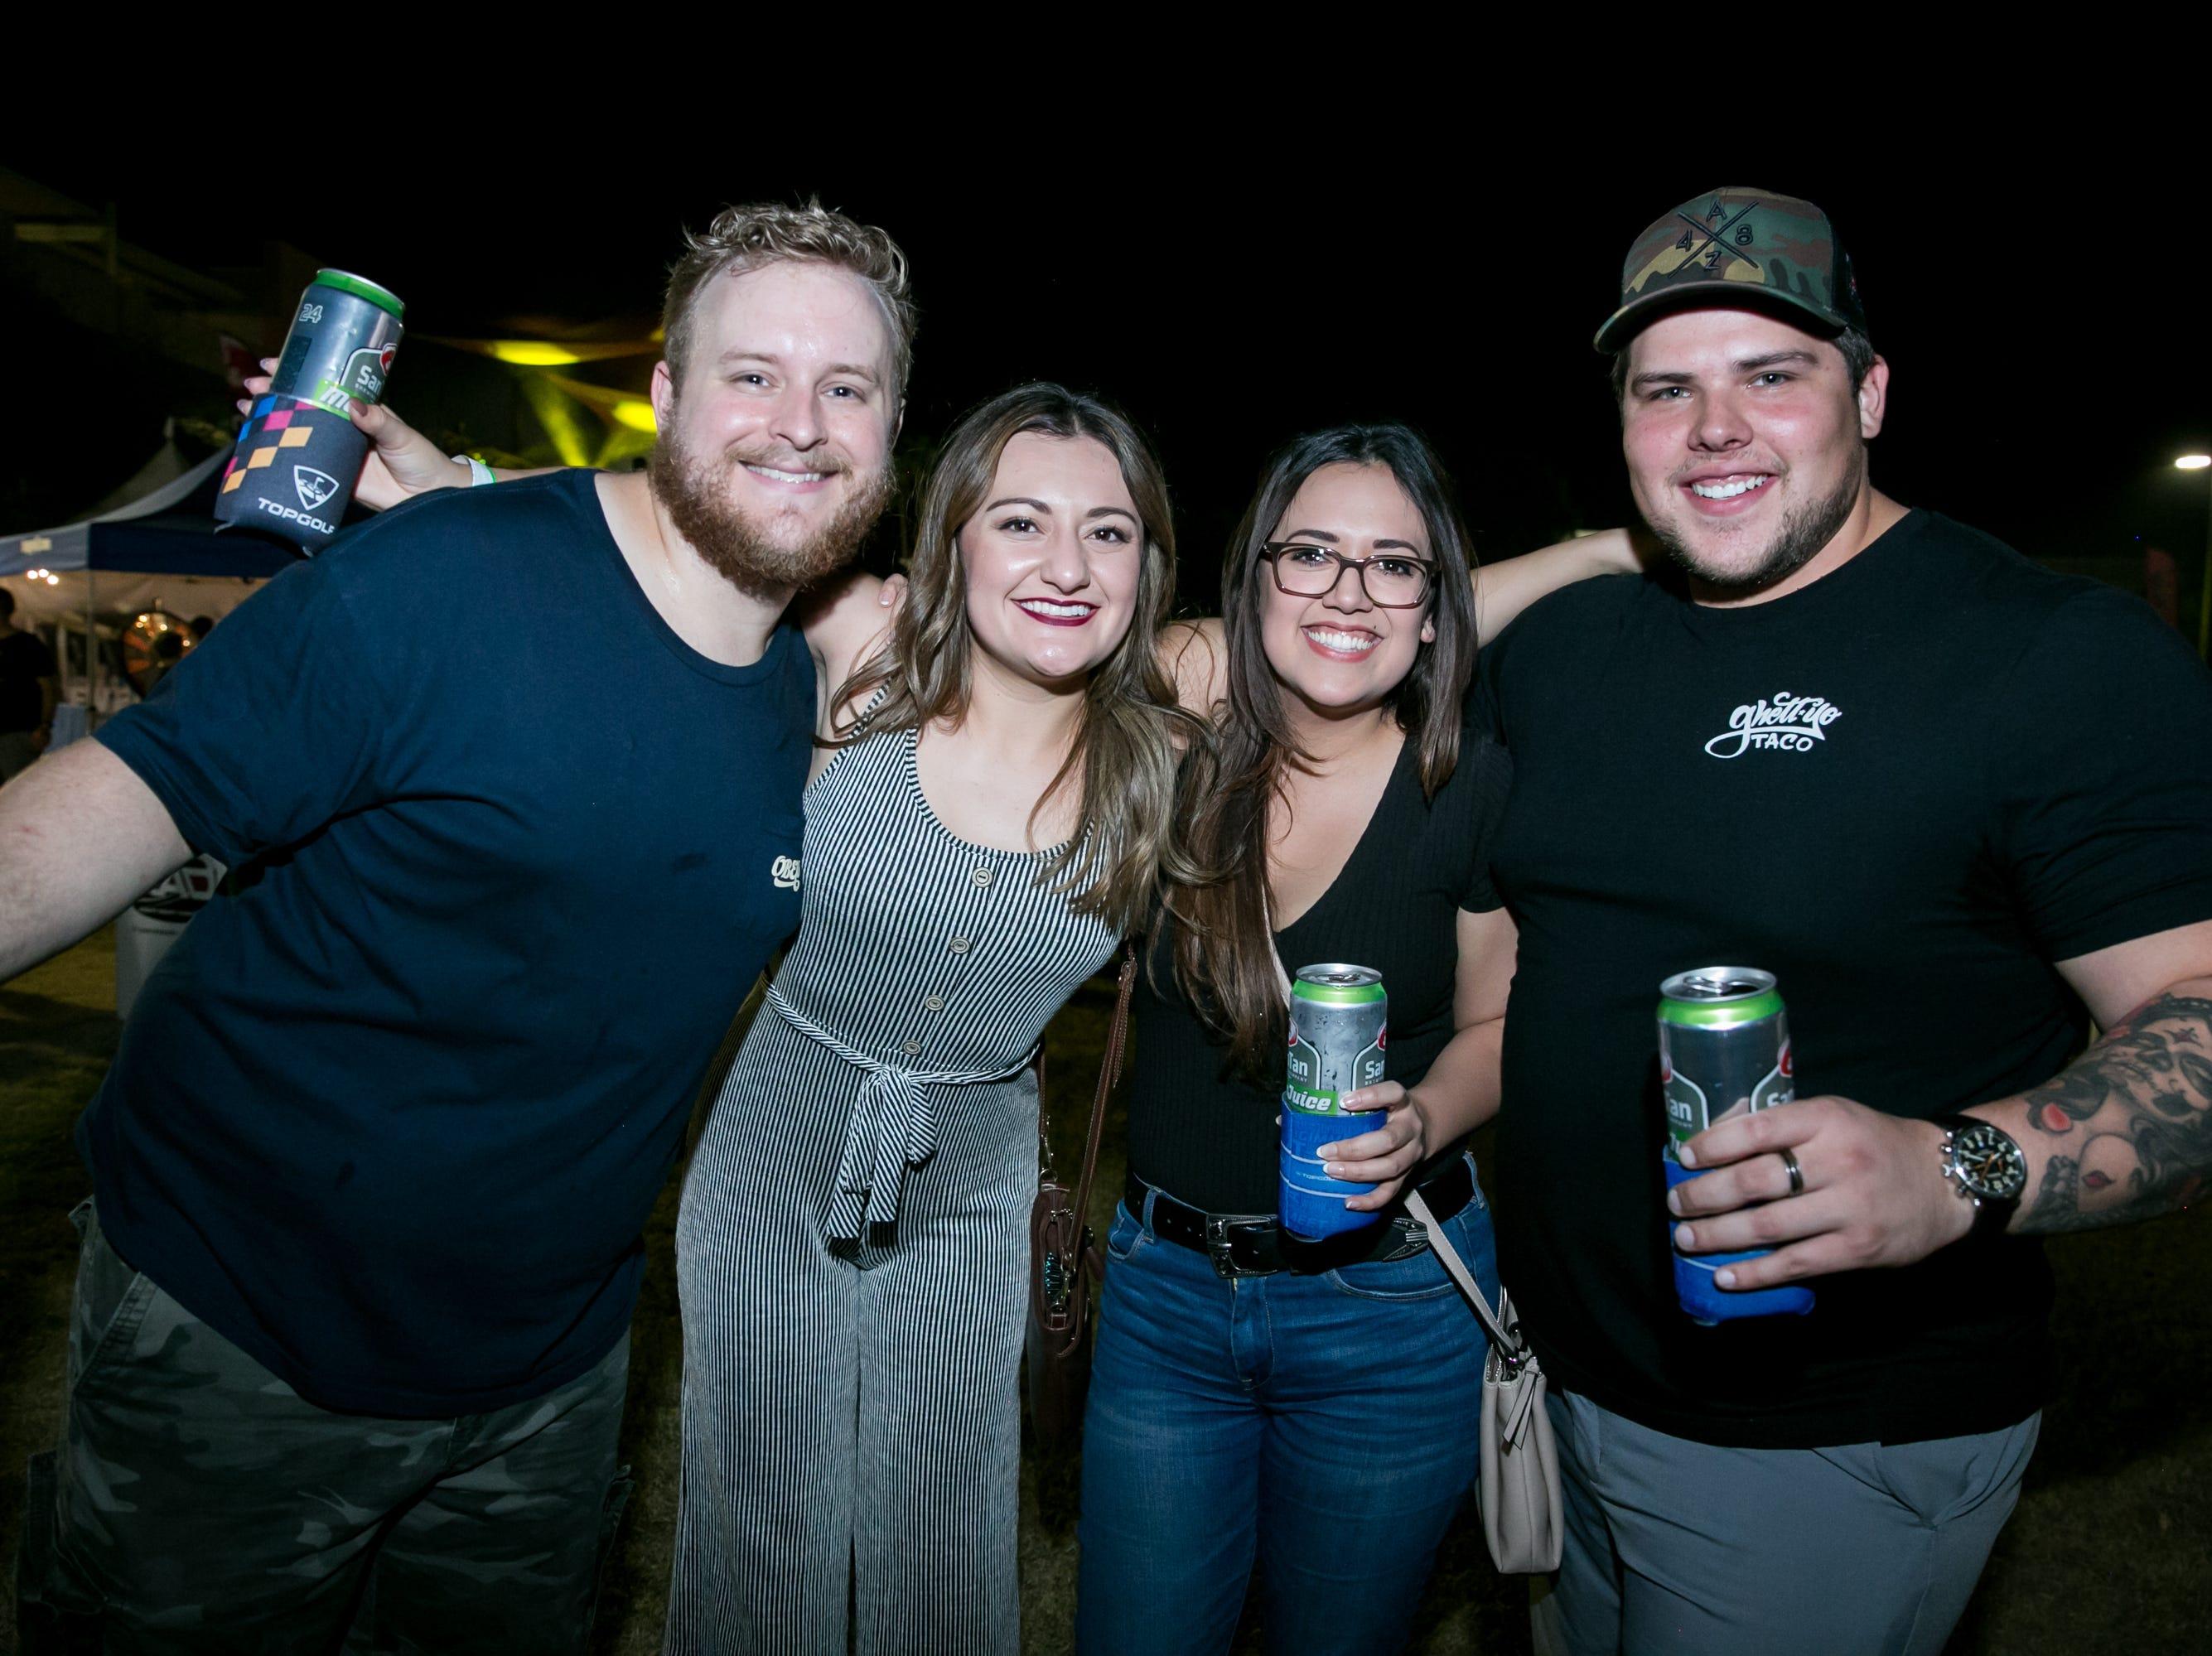 This group had fun during SanTan Brewing Oktoberfest at Dr. AJ Chandler Park in Chandler on Saturday, September 29, 2018.